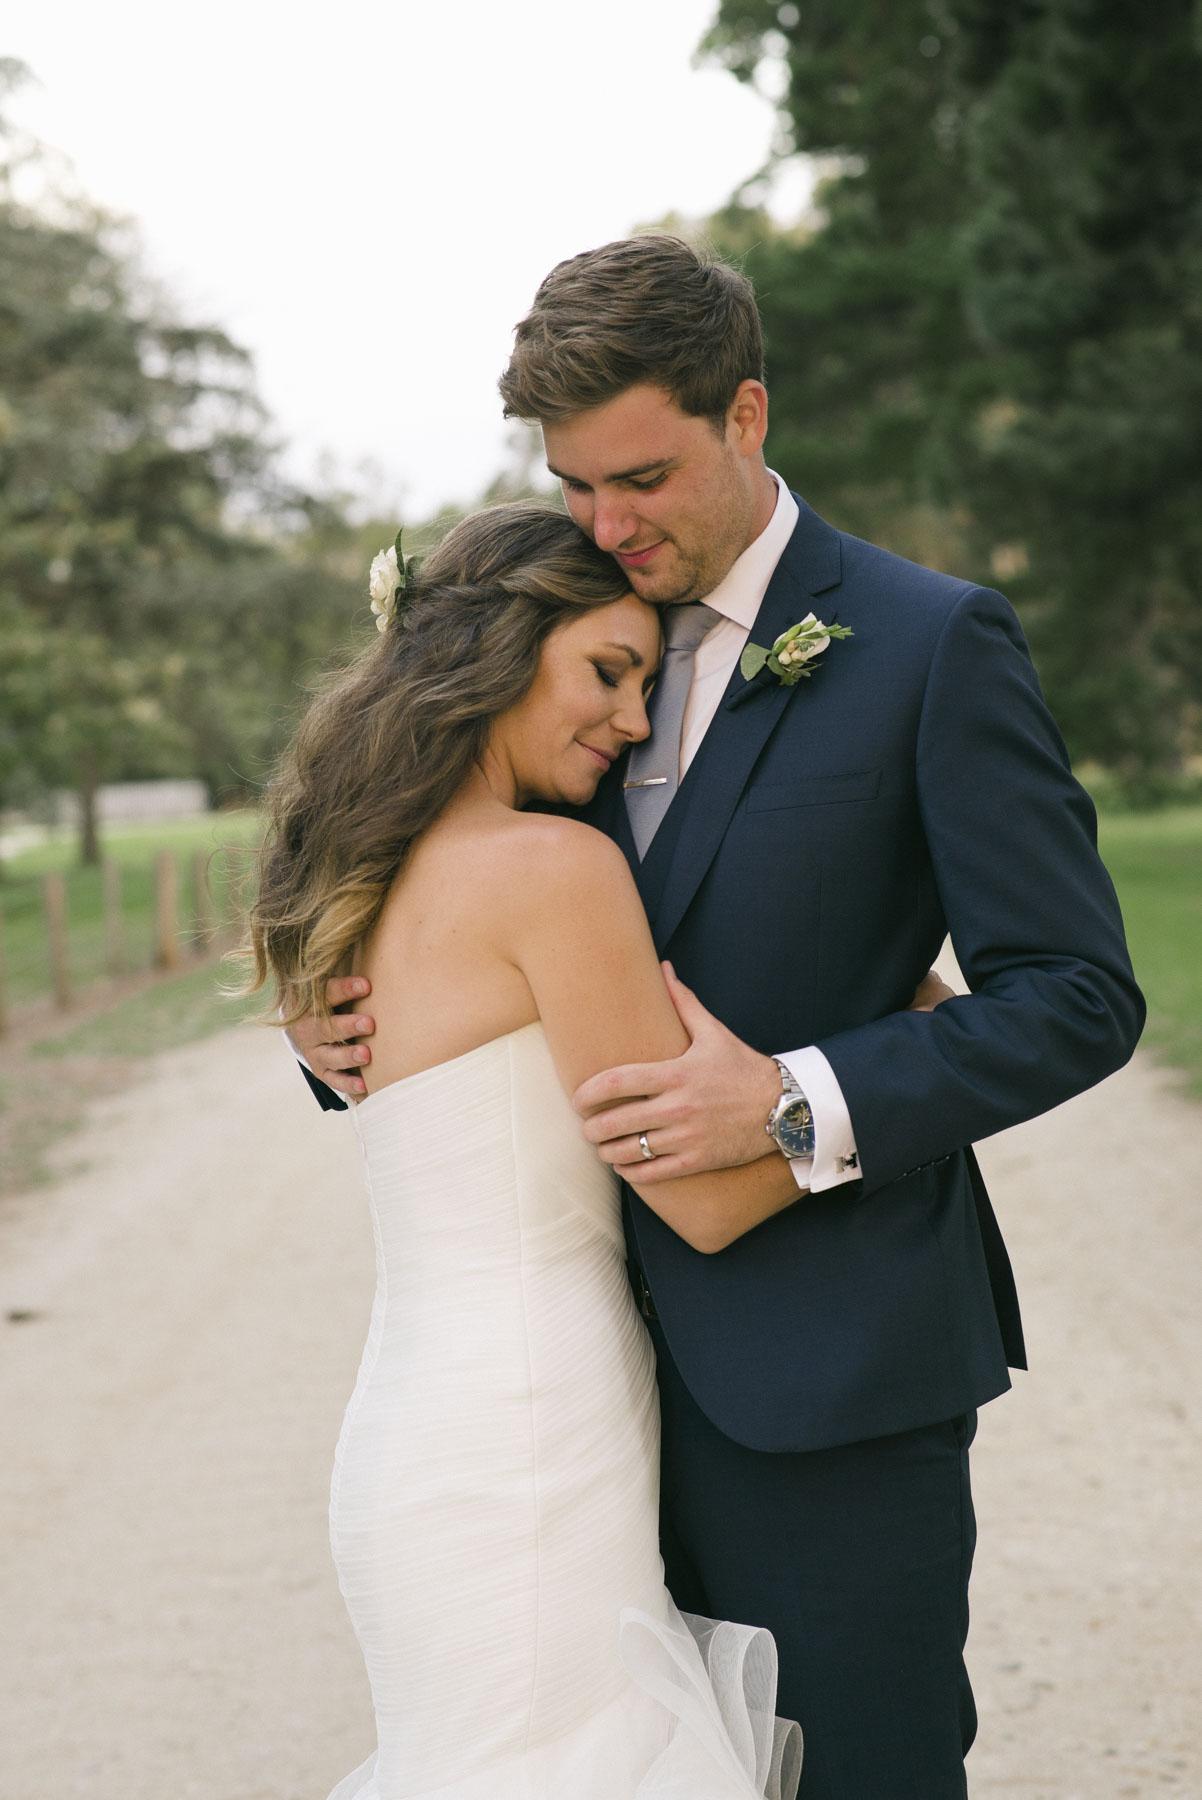 1501vand-385alan_moyle_wedding_portrait_brighton_bayside_werribee_estate_mansion_zoo_rustic_styled_garden_mansion_candid_documentry_victoria_whitelaw.jpg